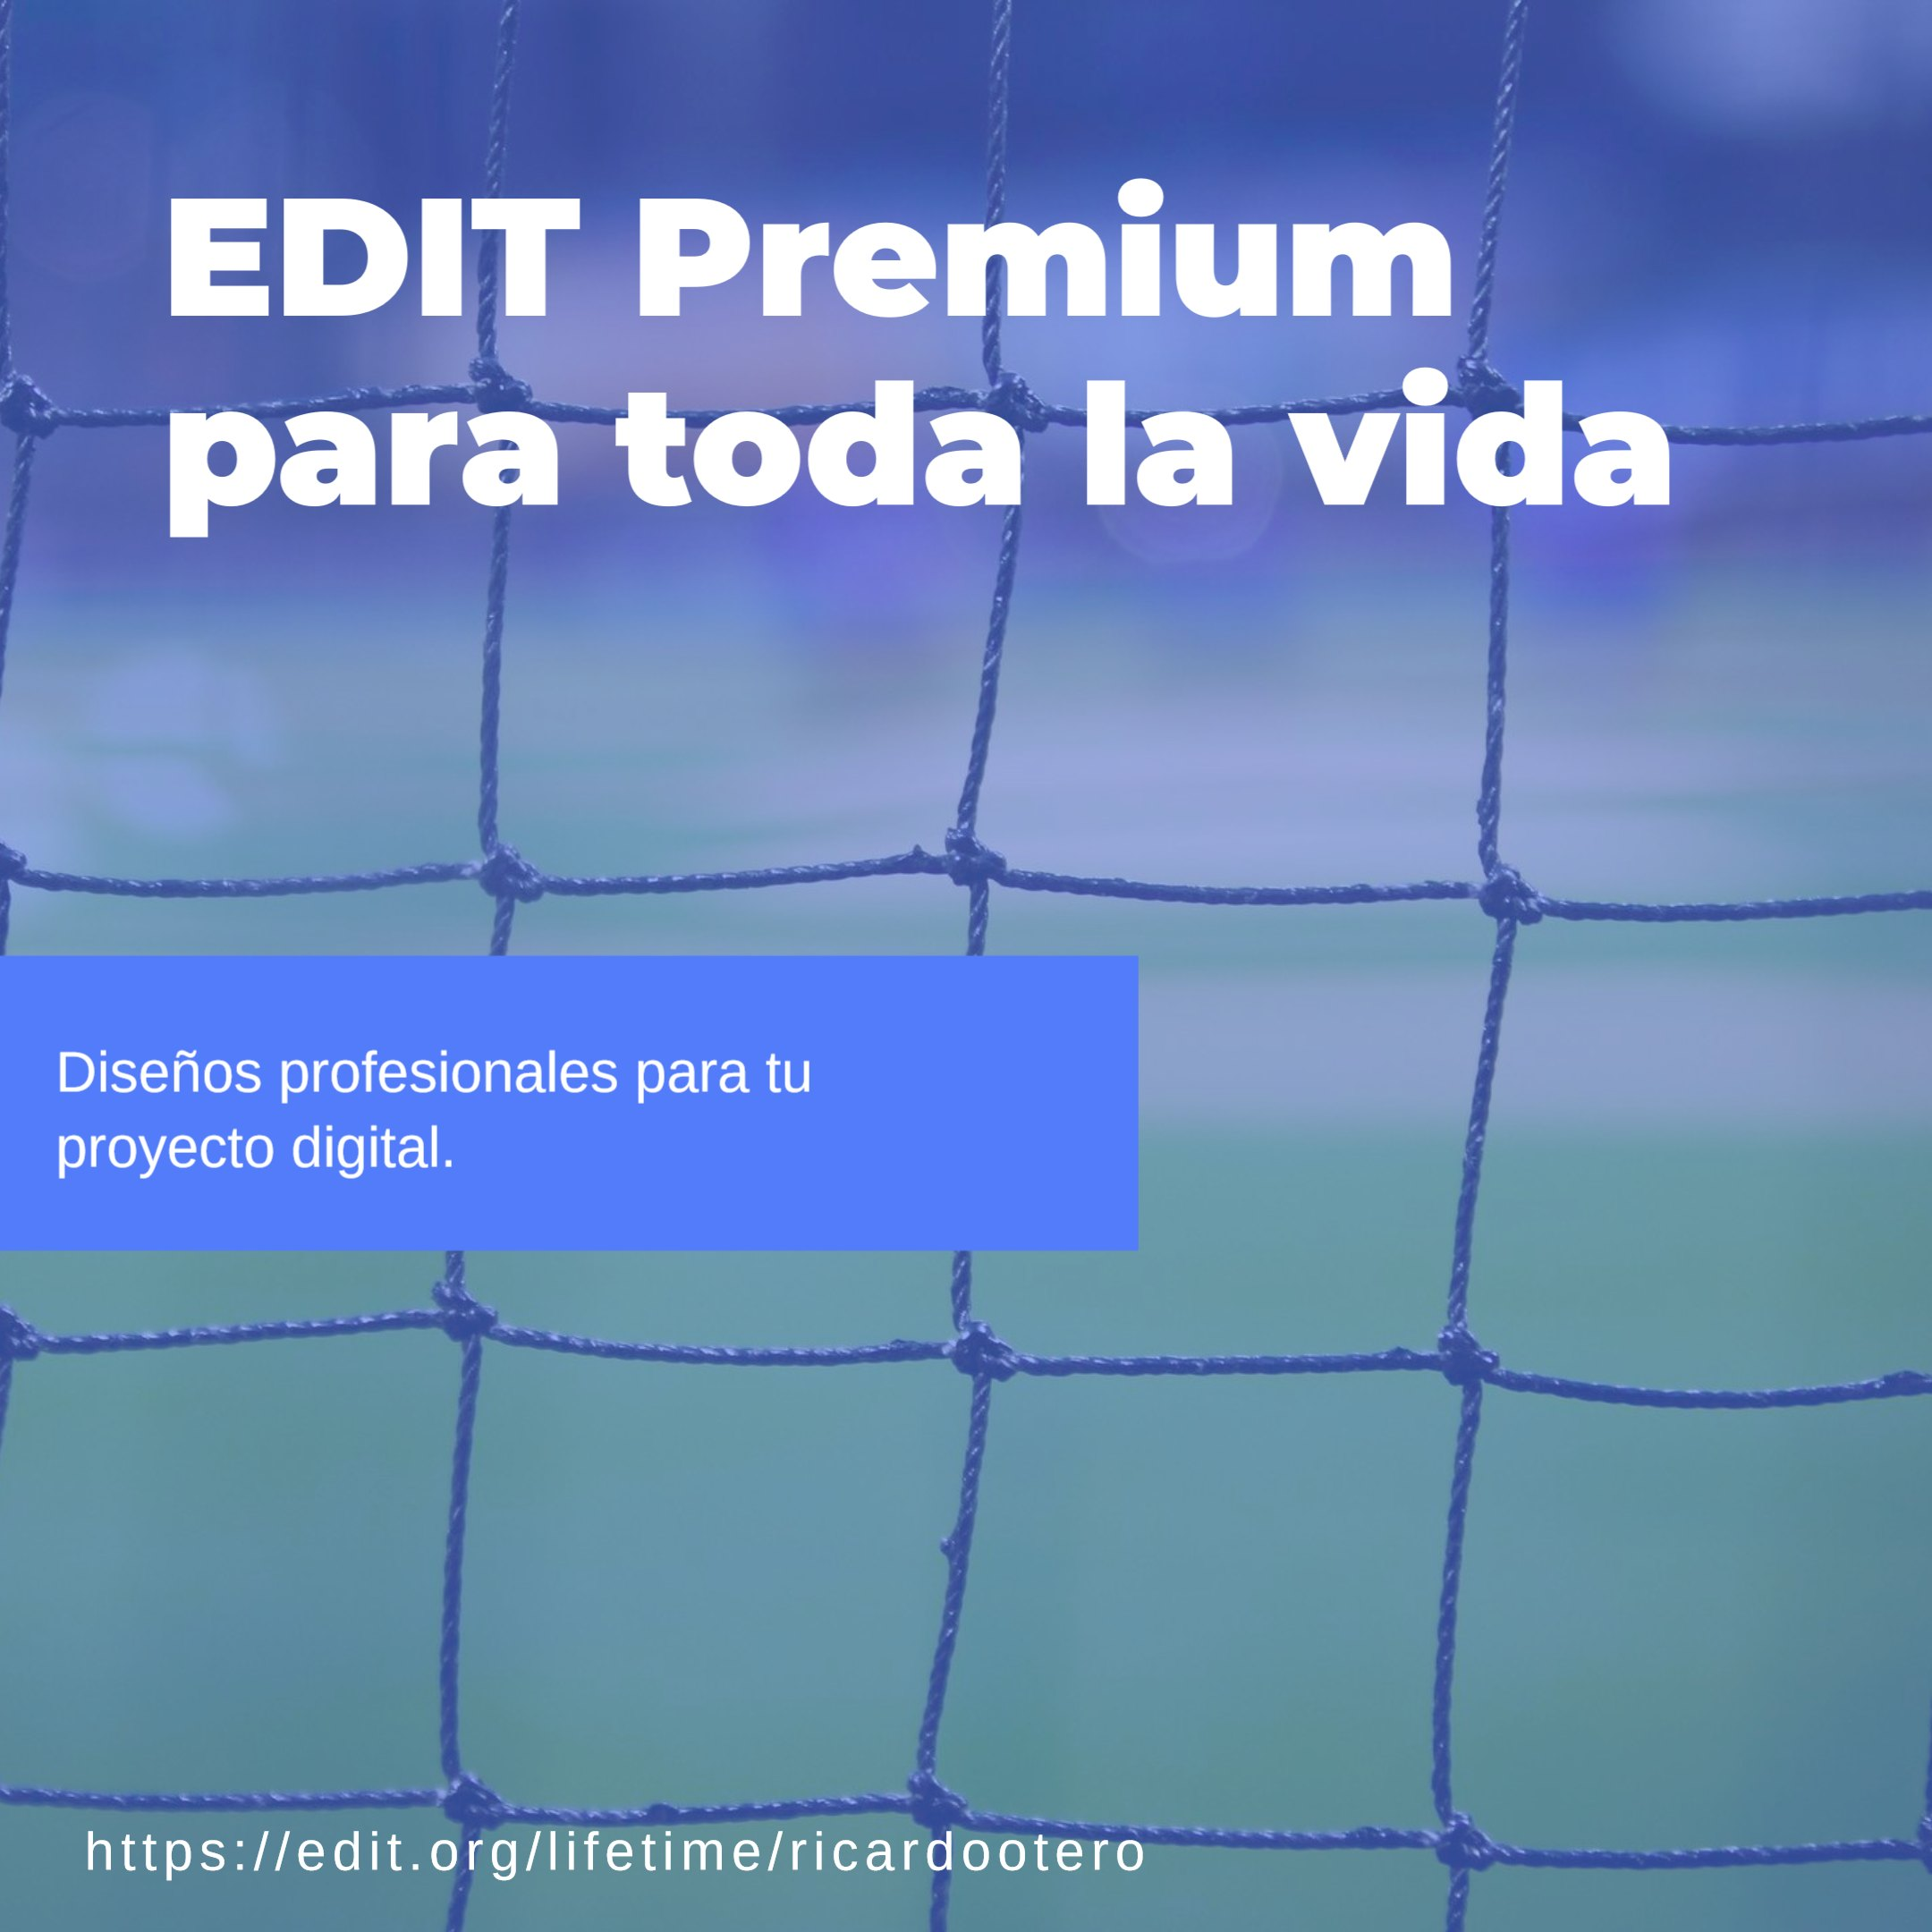 edit premium para toda la vida